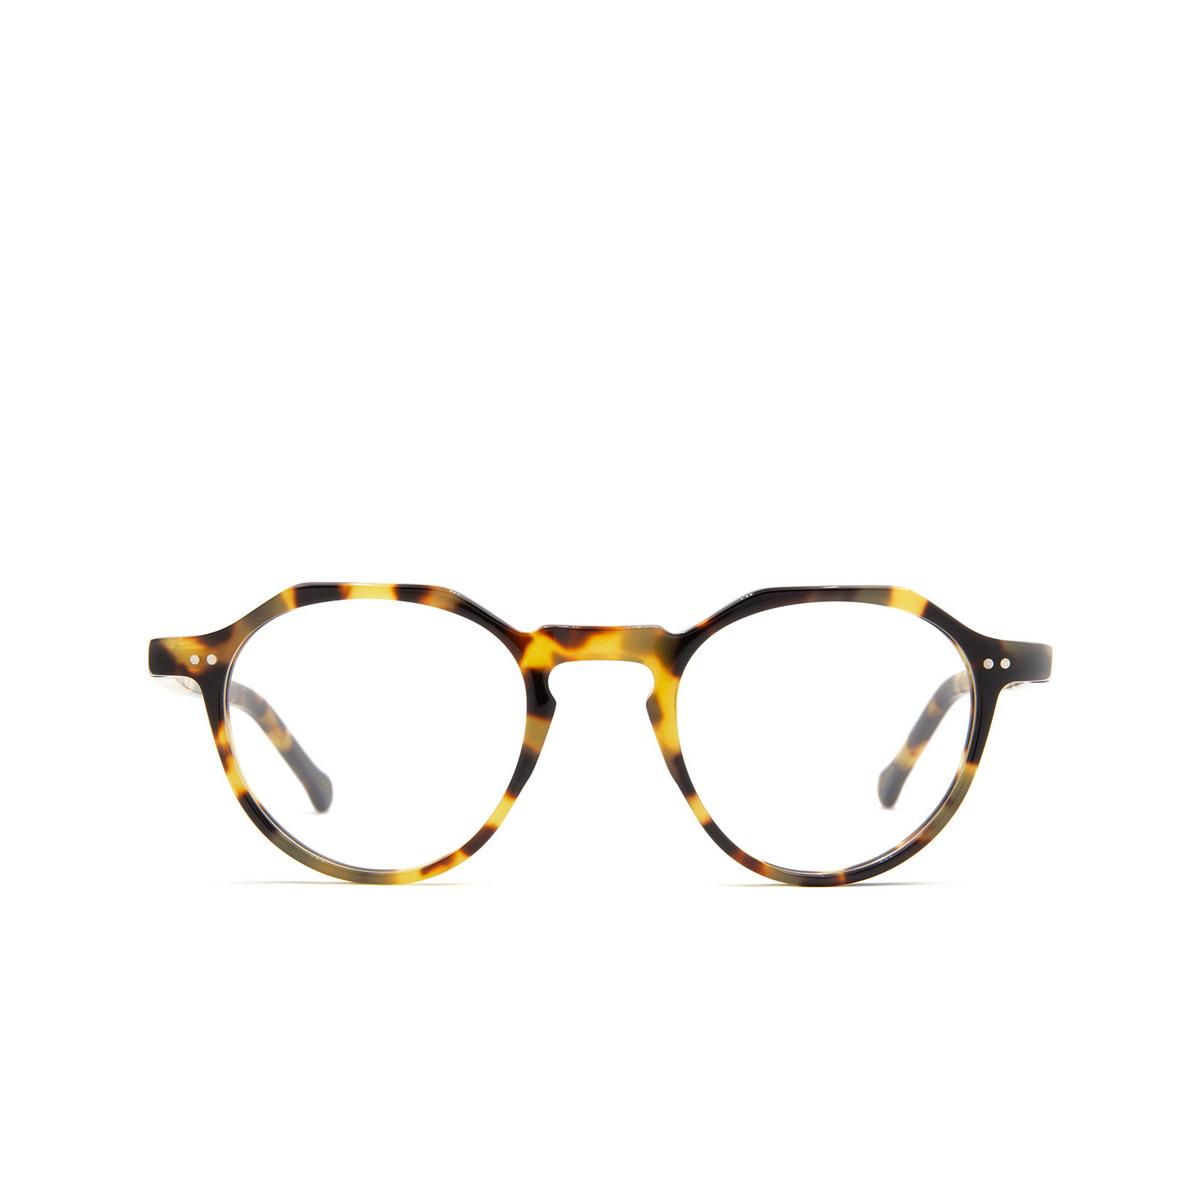 Lesca® Irregular Eyeglasses: P2 color Light Tortoise 228 - front view.